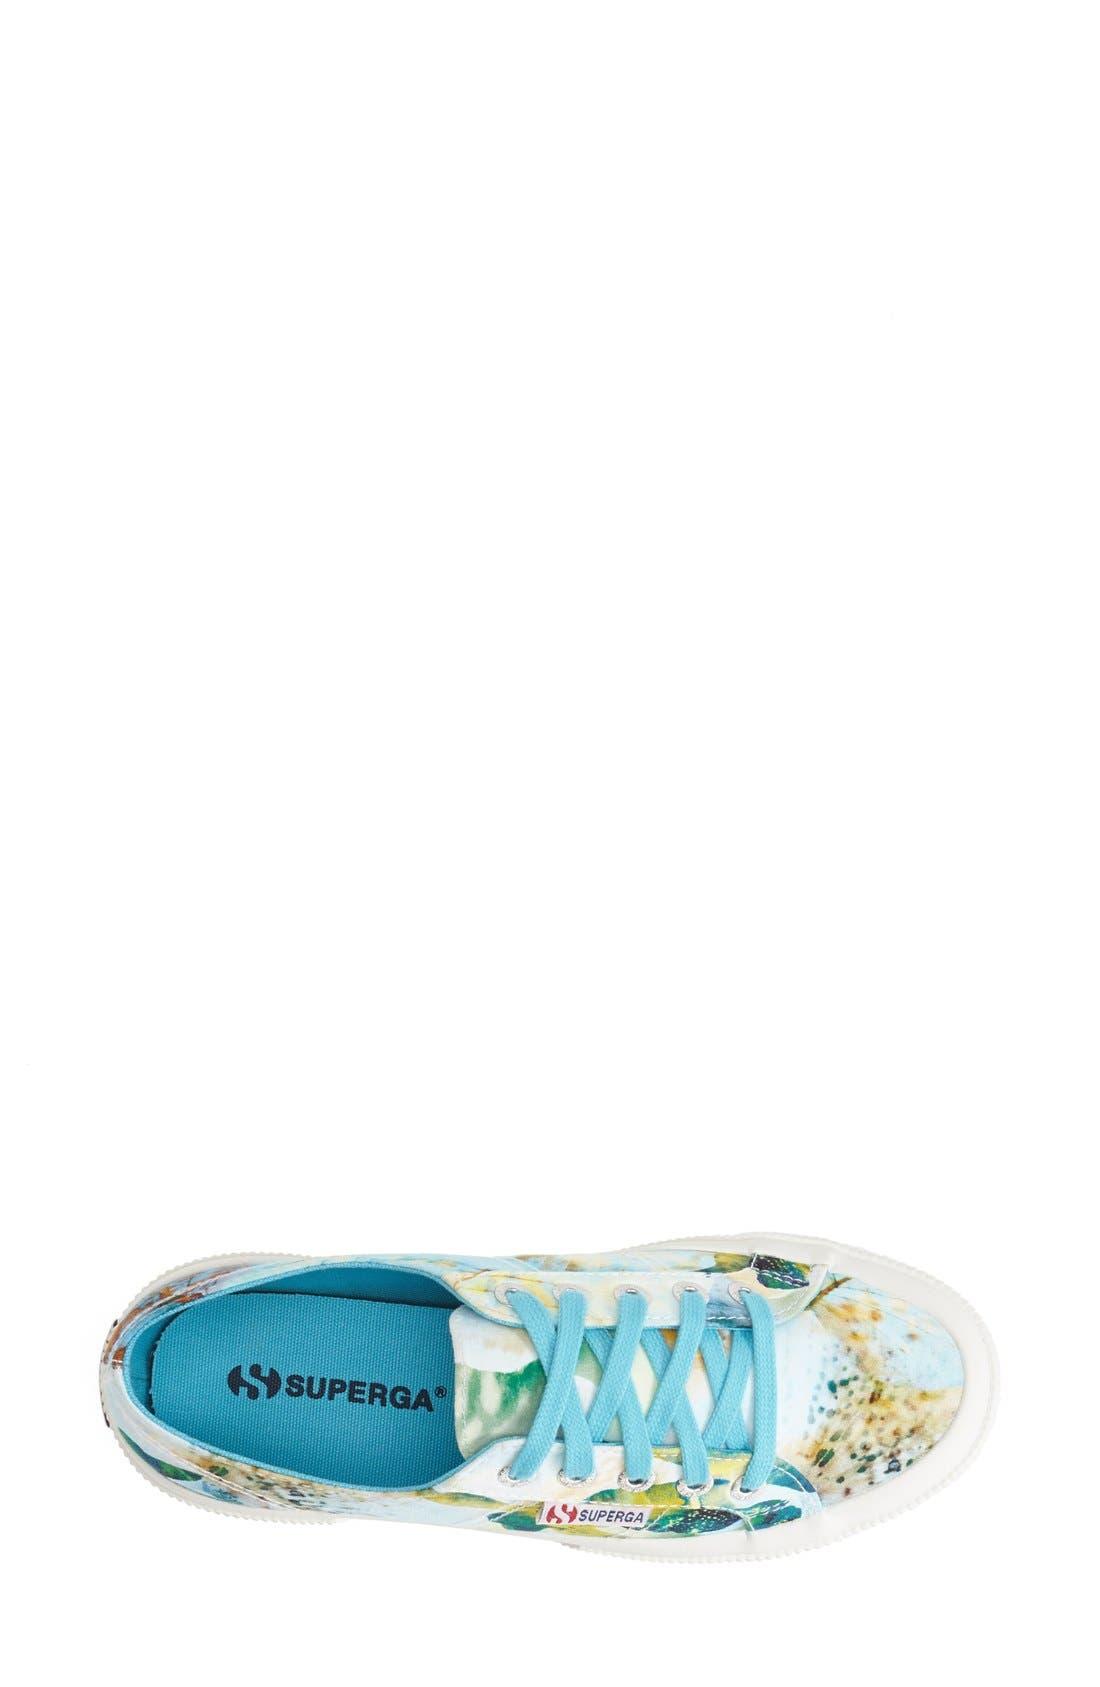 Alternate Image 3  - Superga 'Bahamas' Sneaker (Women)